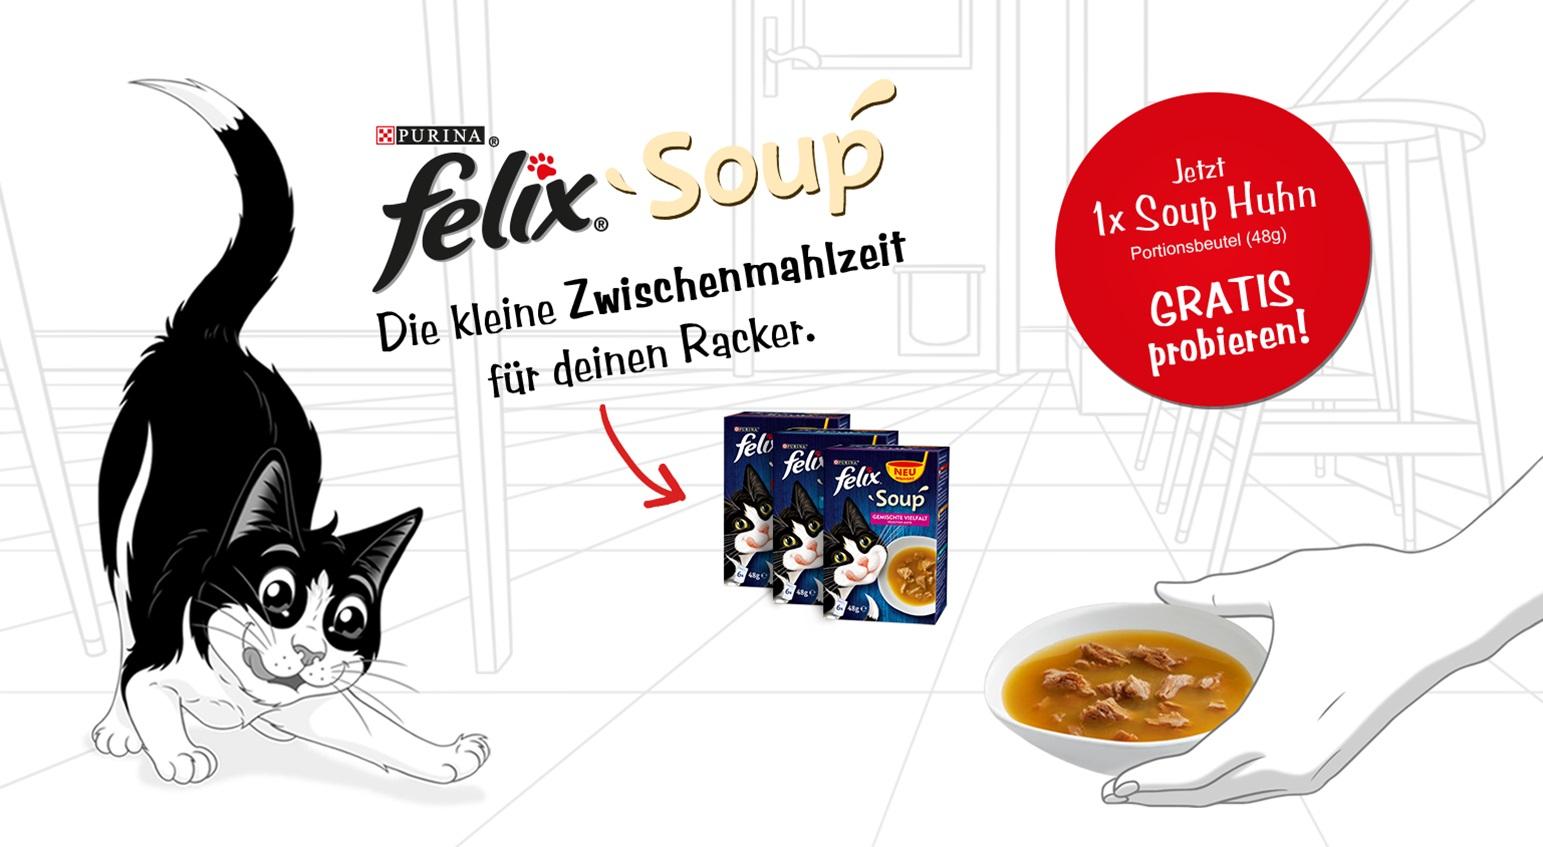 1x Purina Felix Soup gratis testen